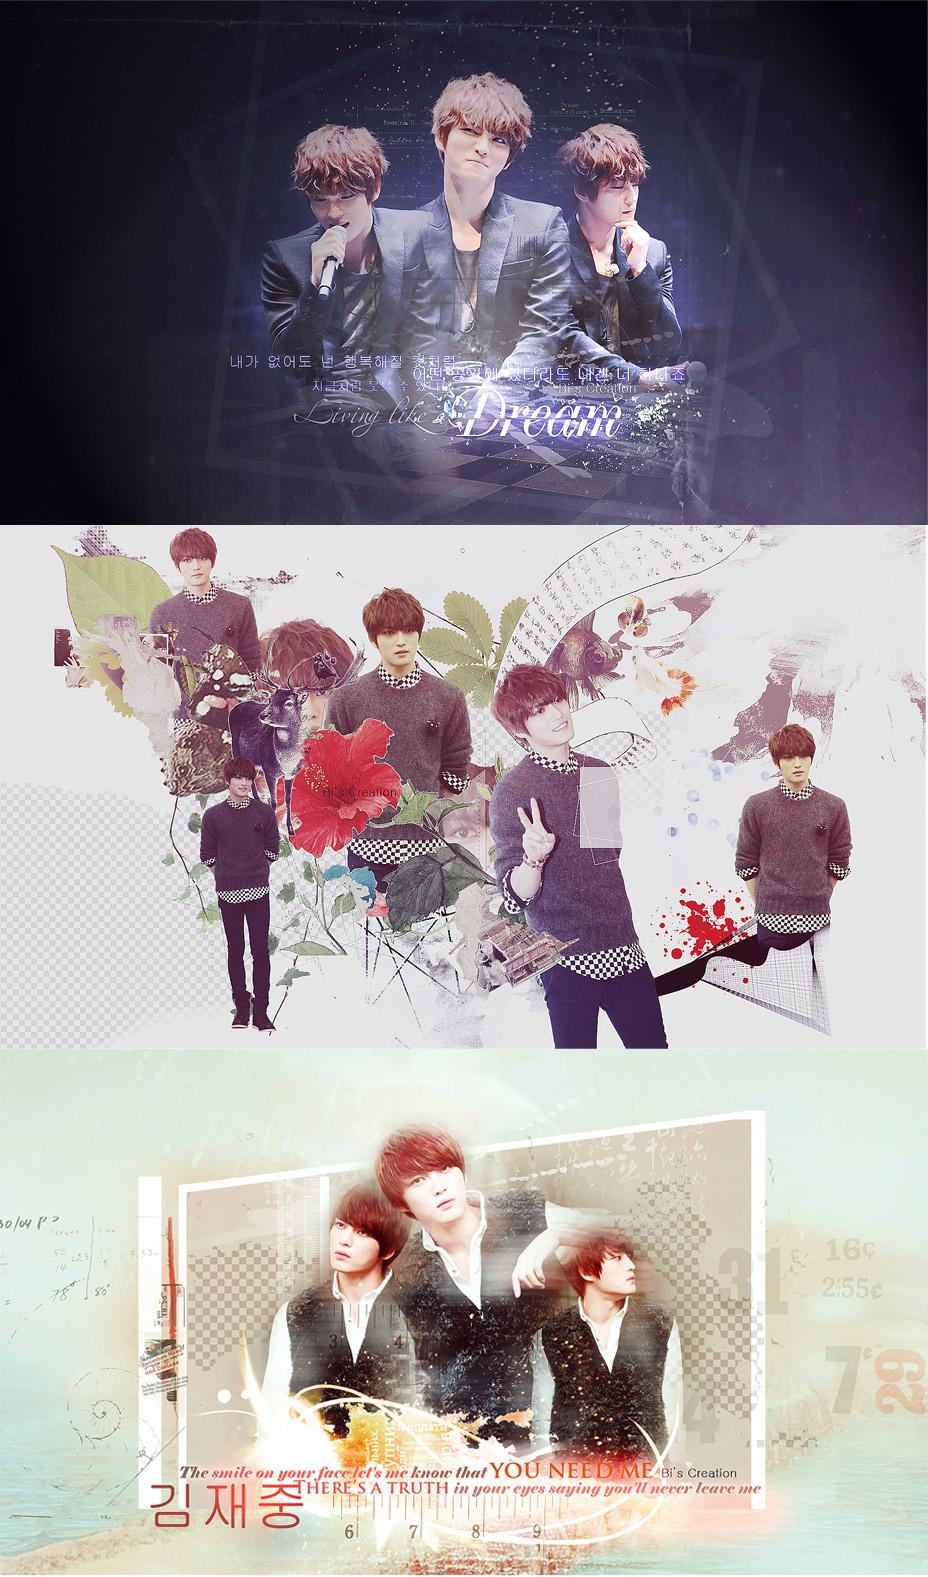 JaeJoong wallpaper pack by BiLyBao